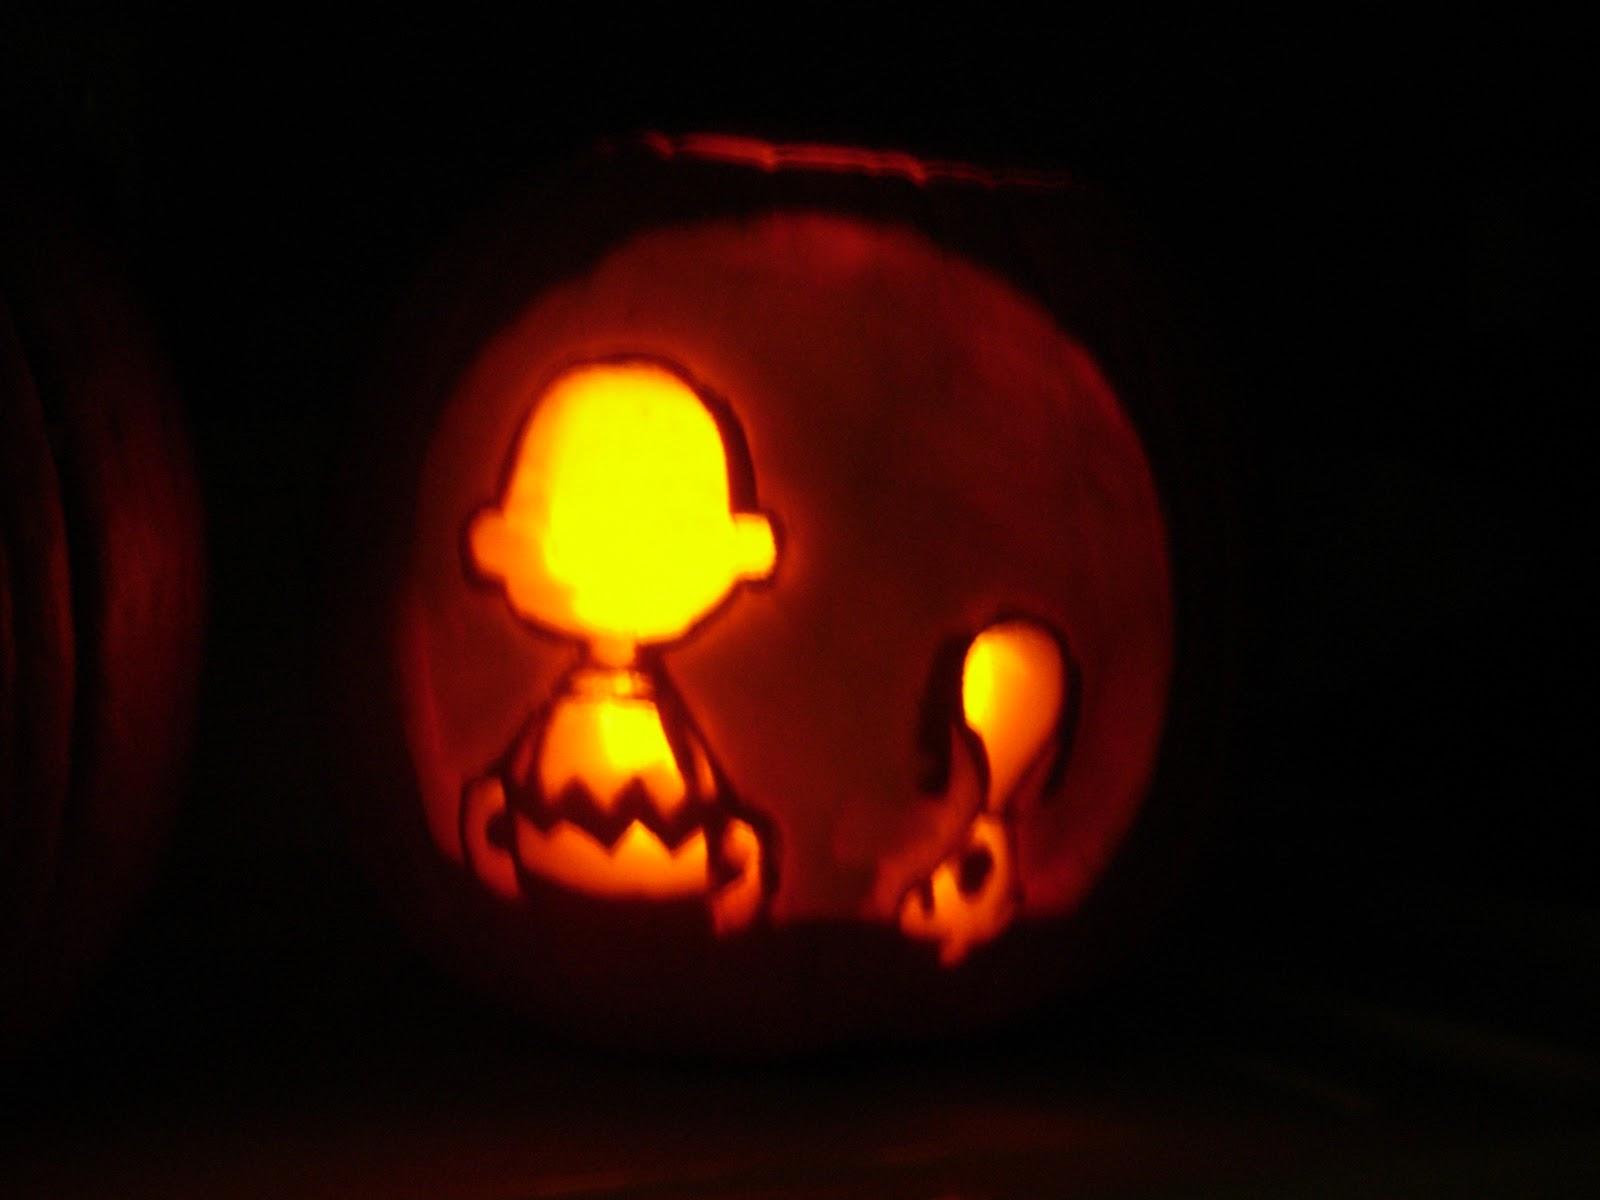 charlie brown pumpkin template - the mathews family happenings pumpkin carving 2011 edition